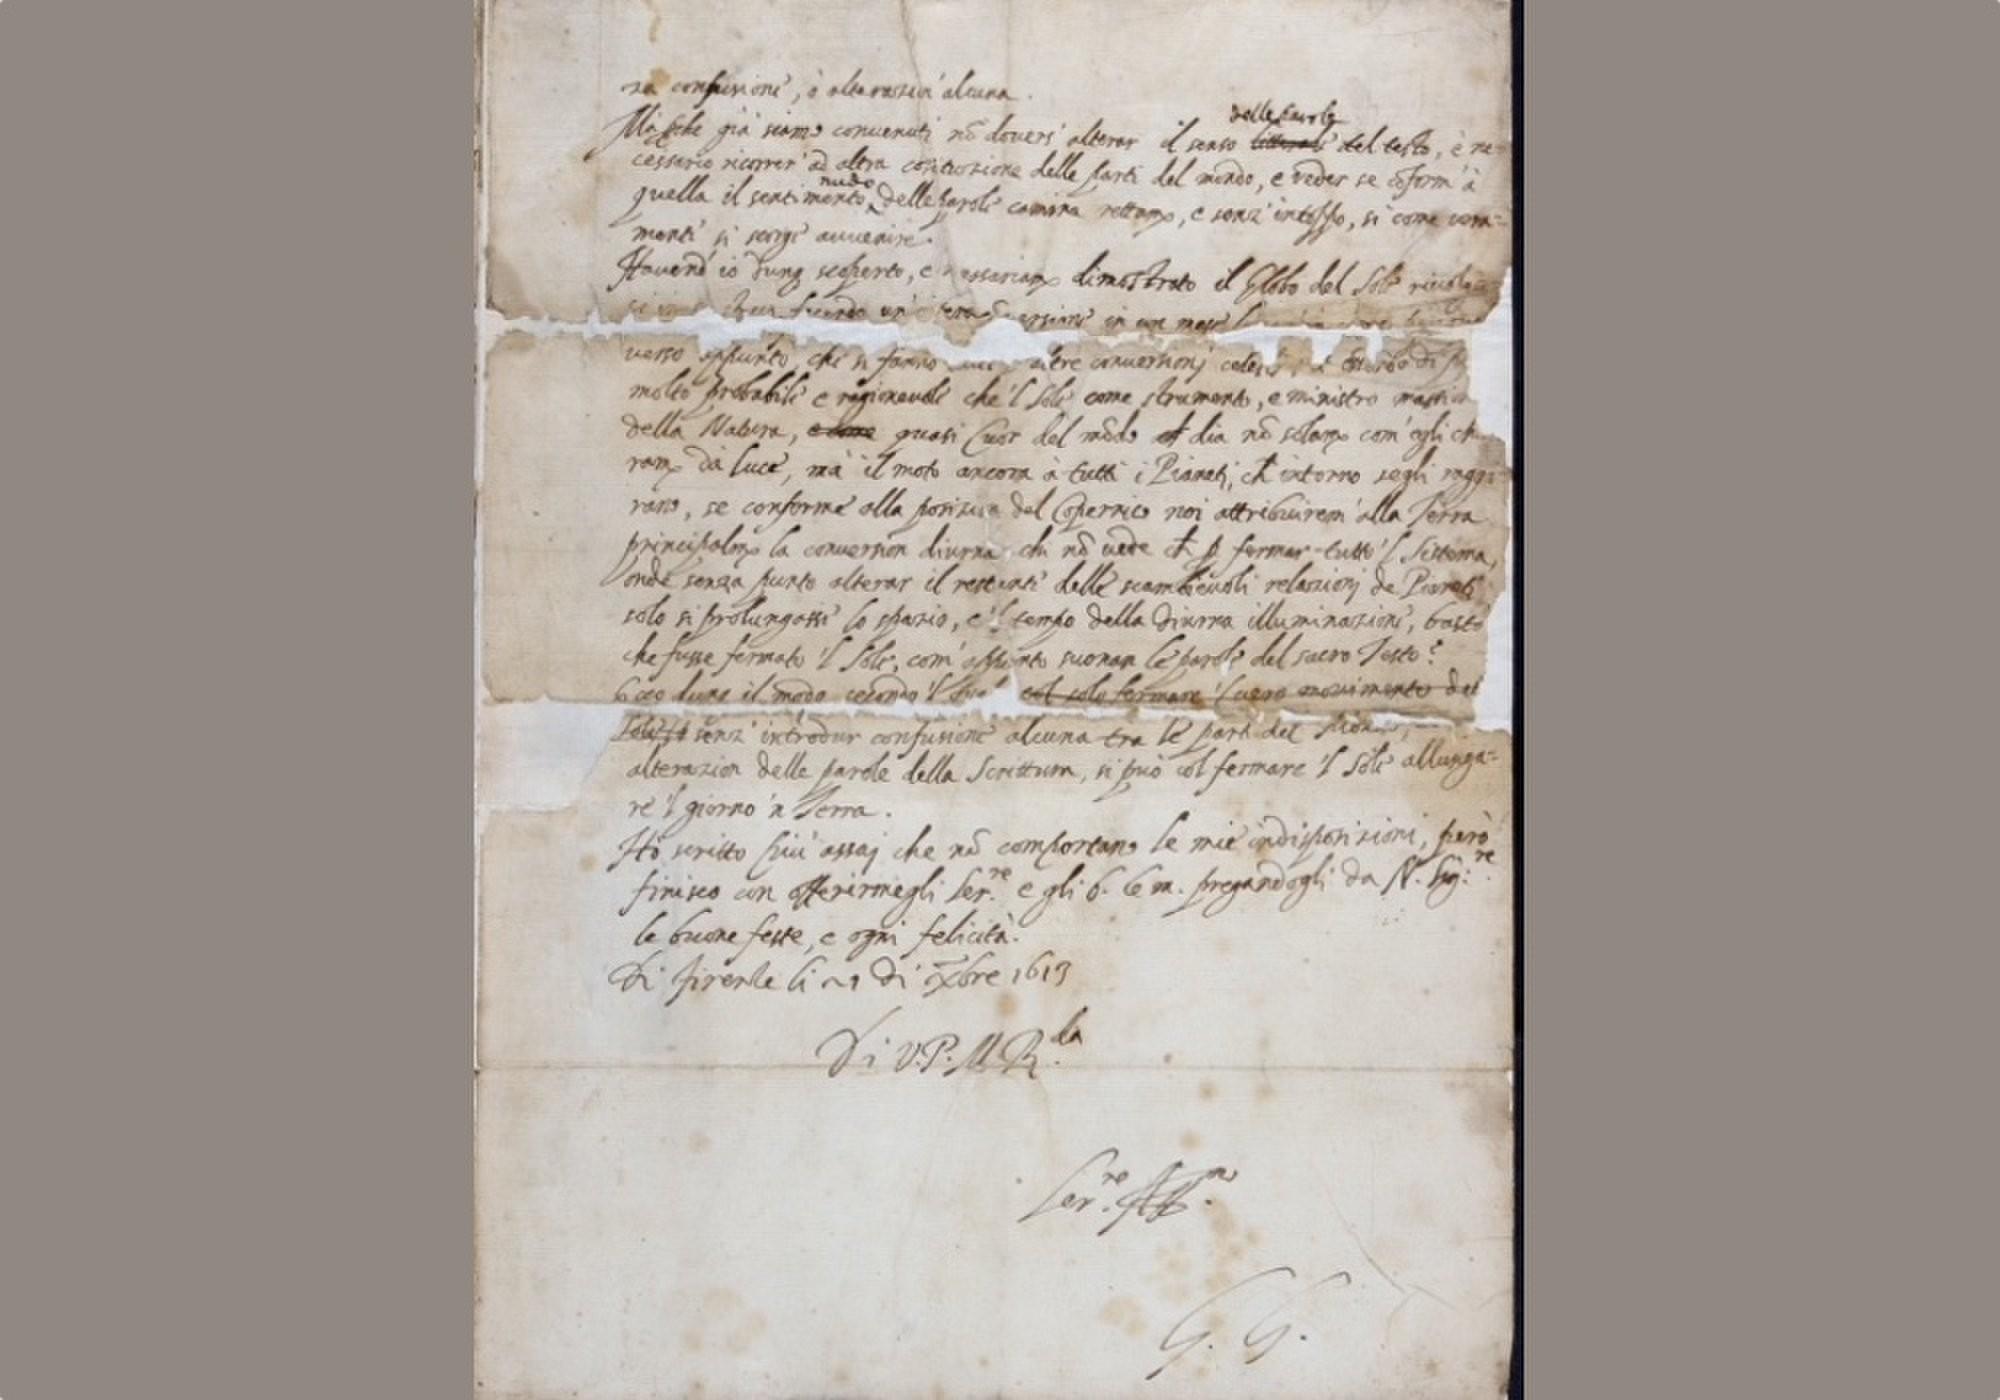 Carta original de Galileu Galilei (Foto: The Royal Society)